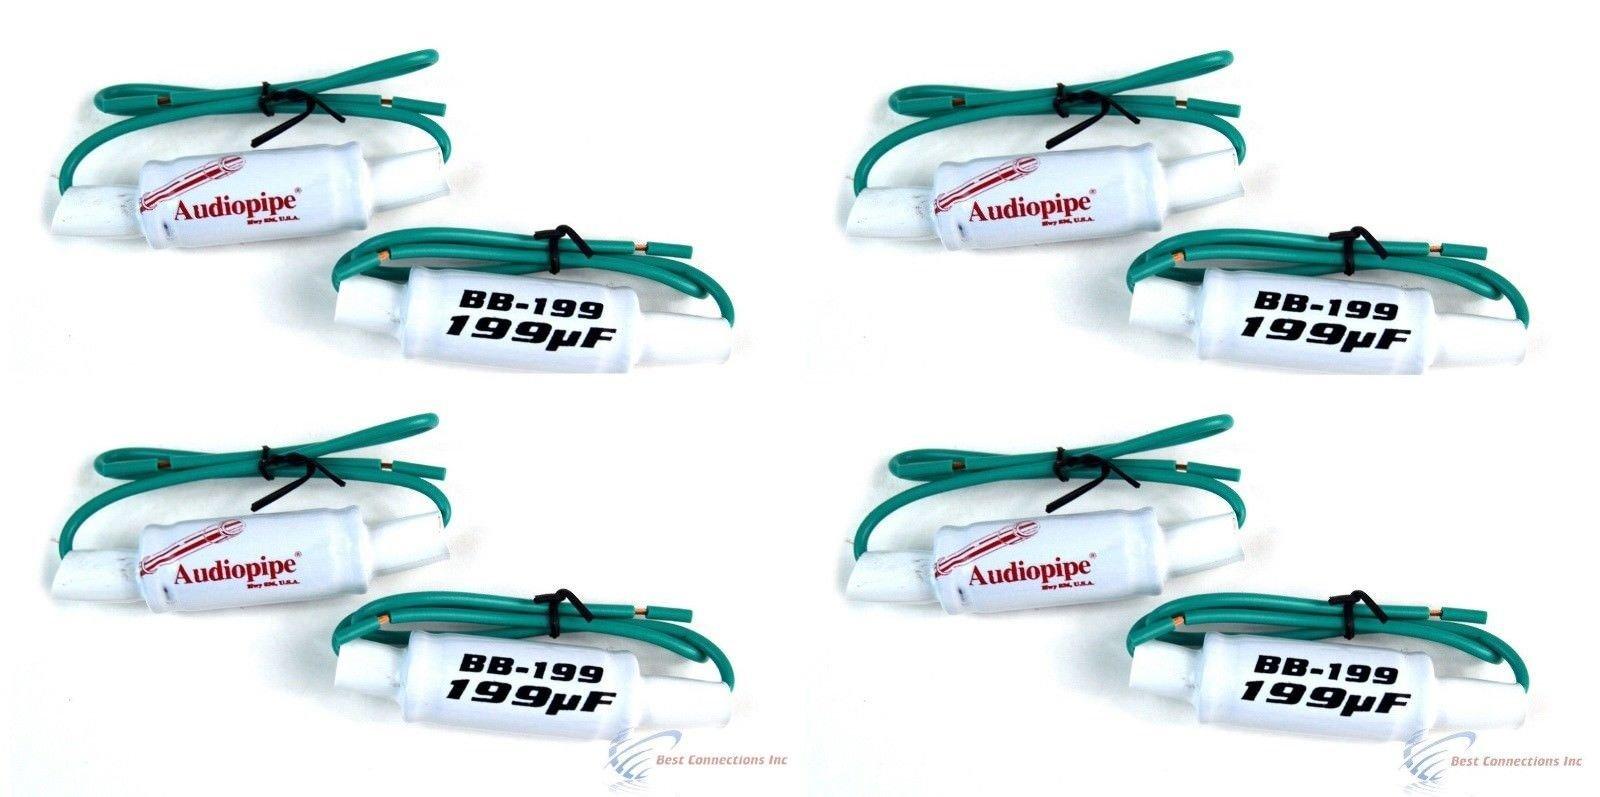 BB-199 6 x 9'' 6 x 8, 7 10'' 199 UF Bass Blockers 200Hz @ 4 OHM 8 PCS by Audiopipe